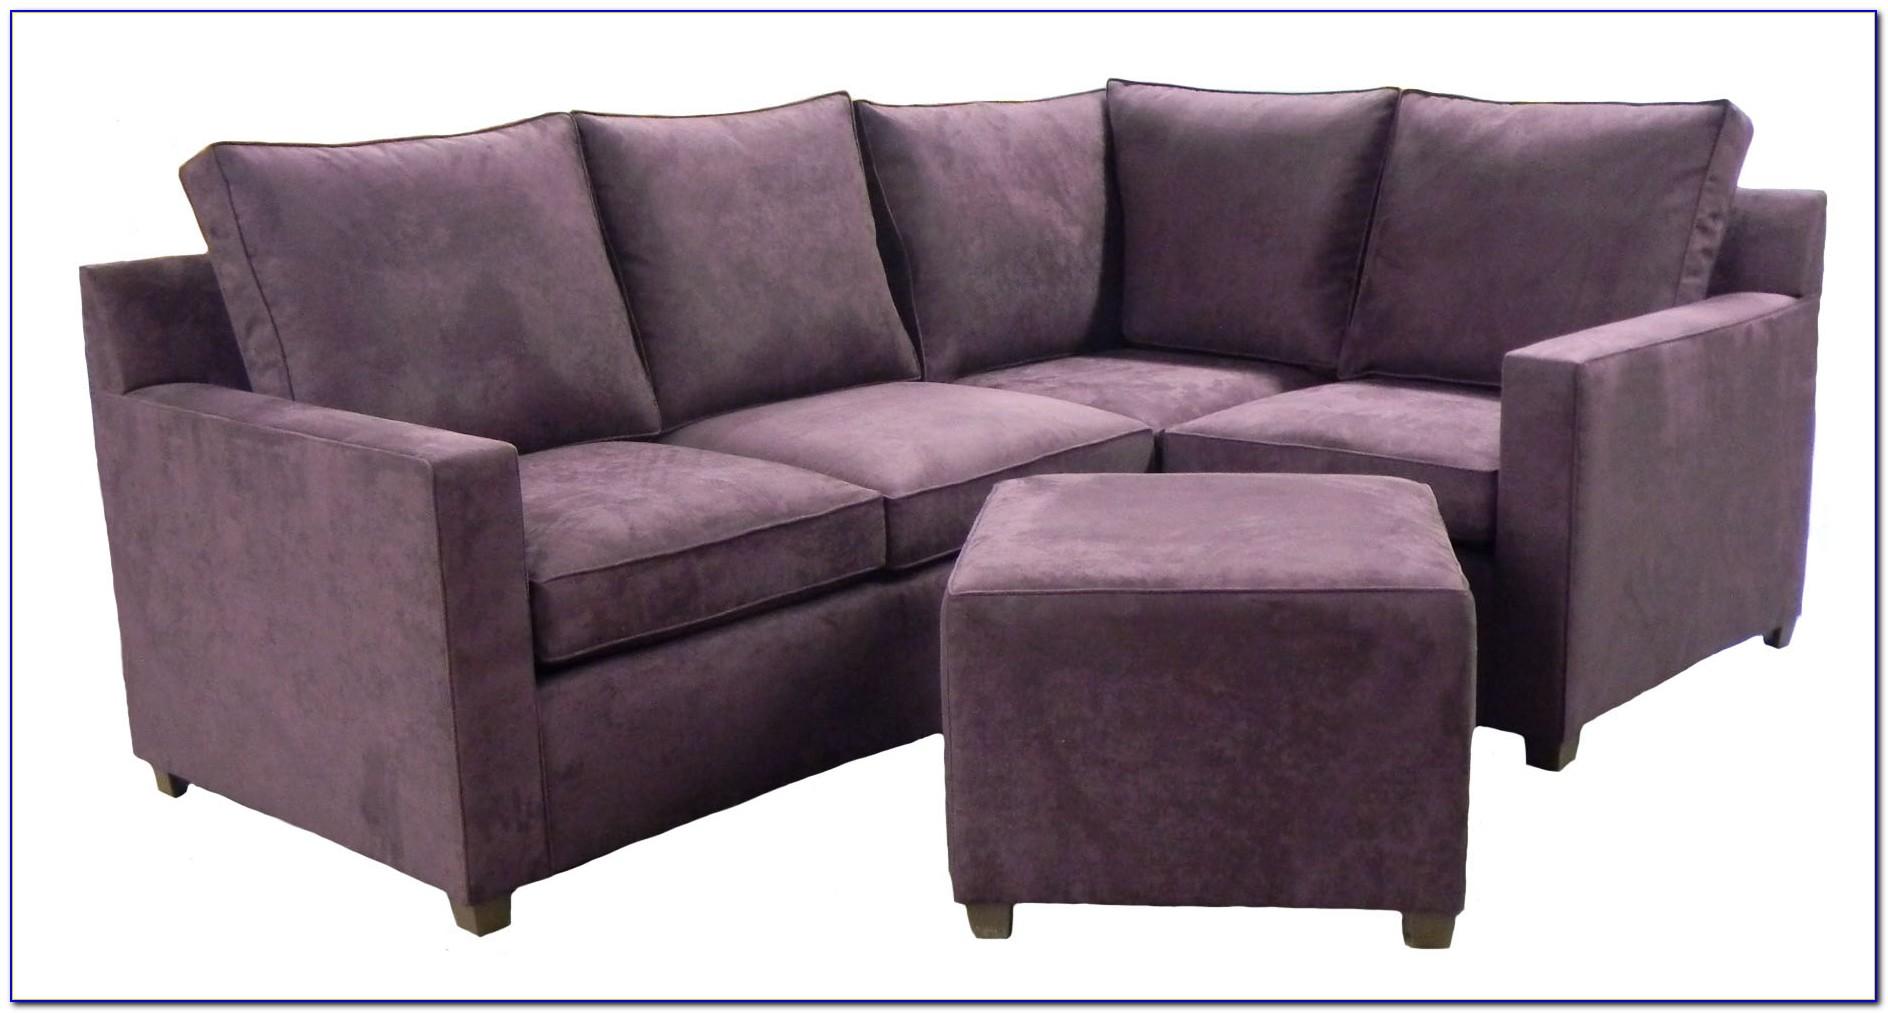 Apartment Size Sectional Sofa Toronto